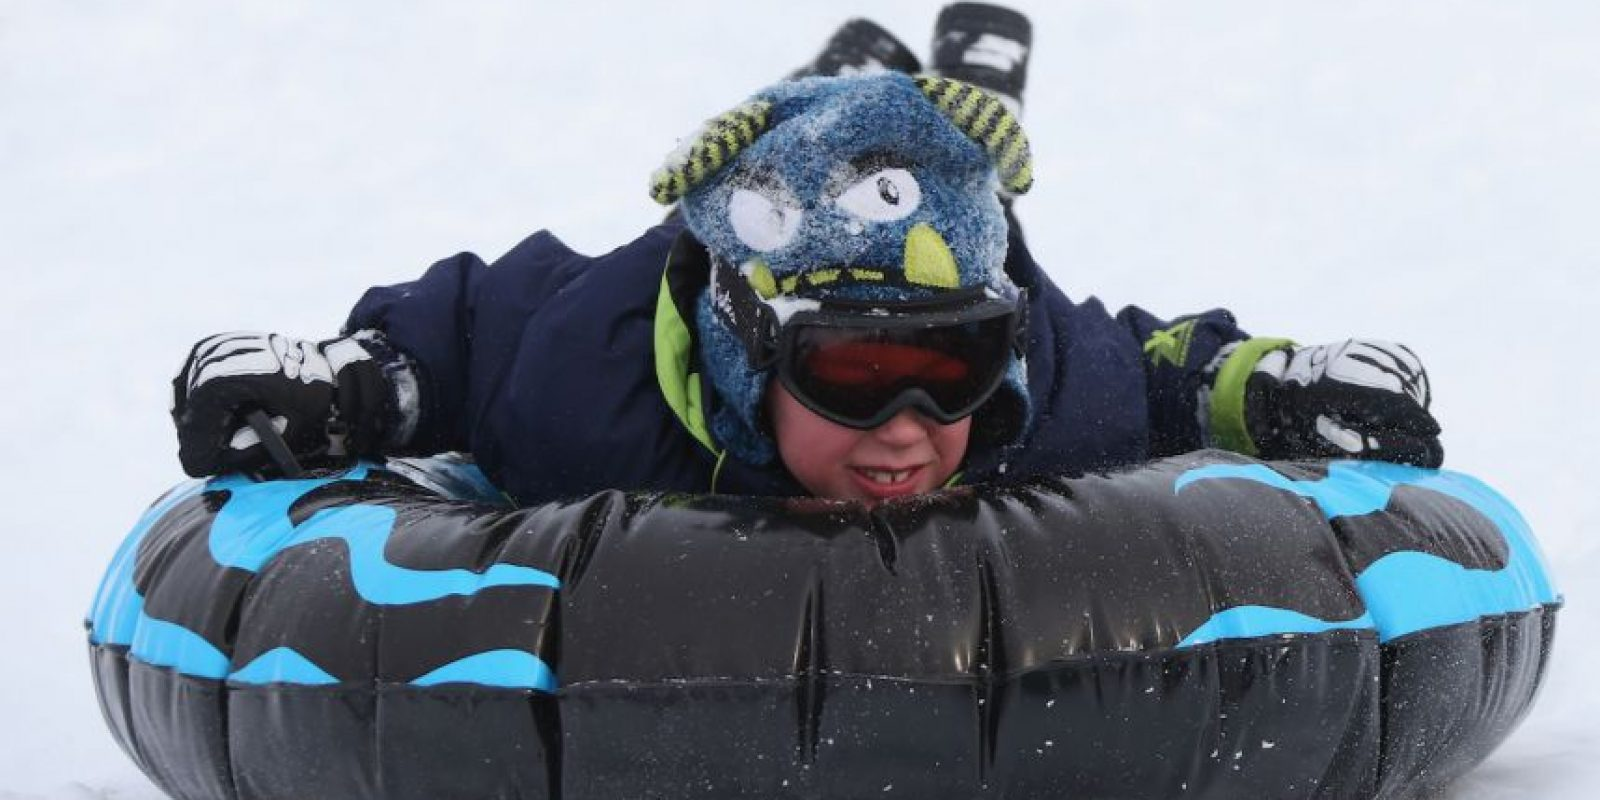 8. Hacer esfuerzos agotadores o no ingerir alimentos o bebidas suficientes en climas fríos. Foto:Getty